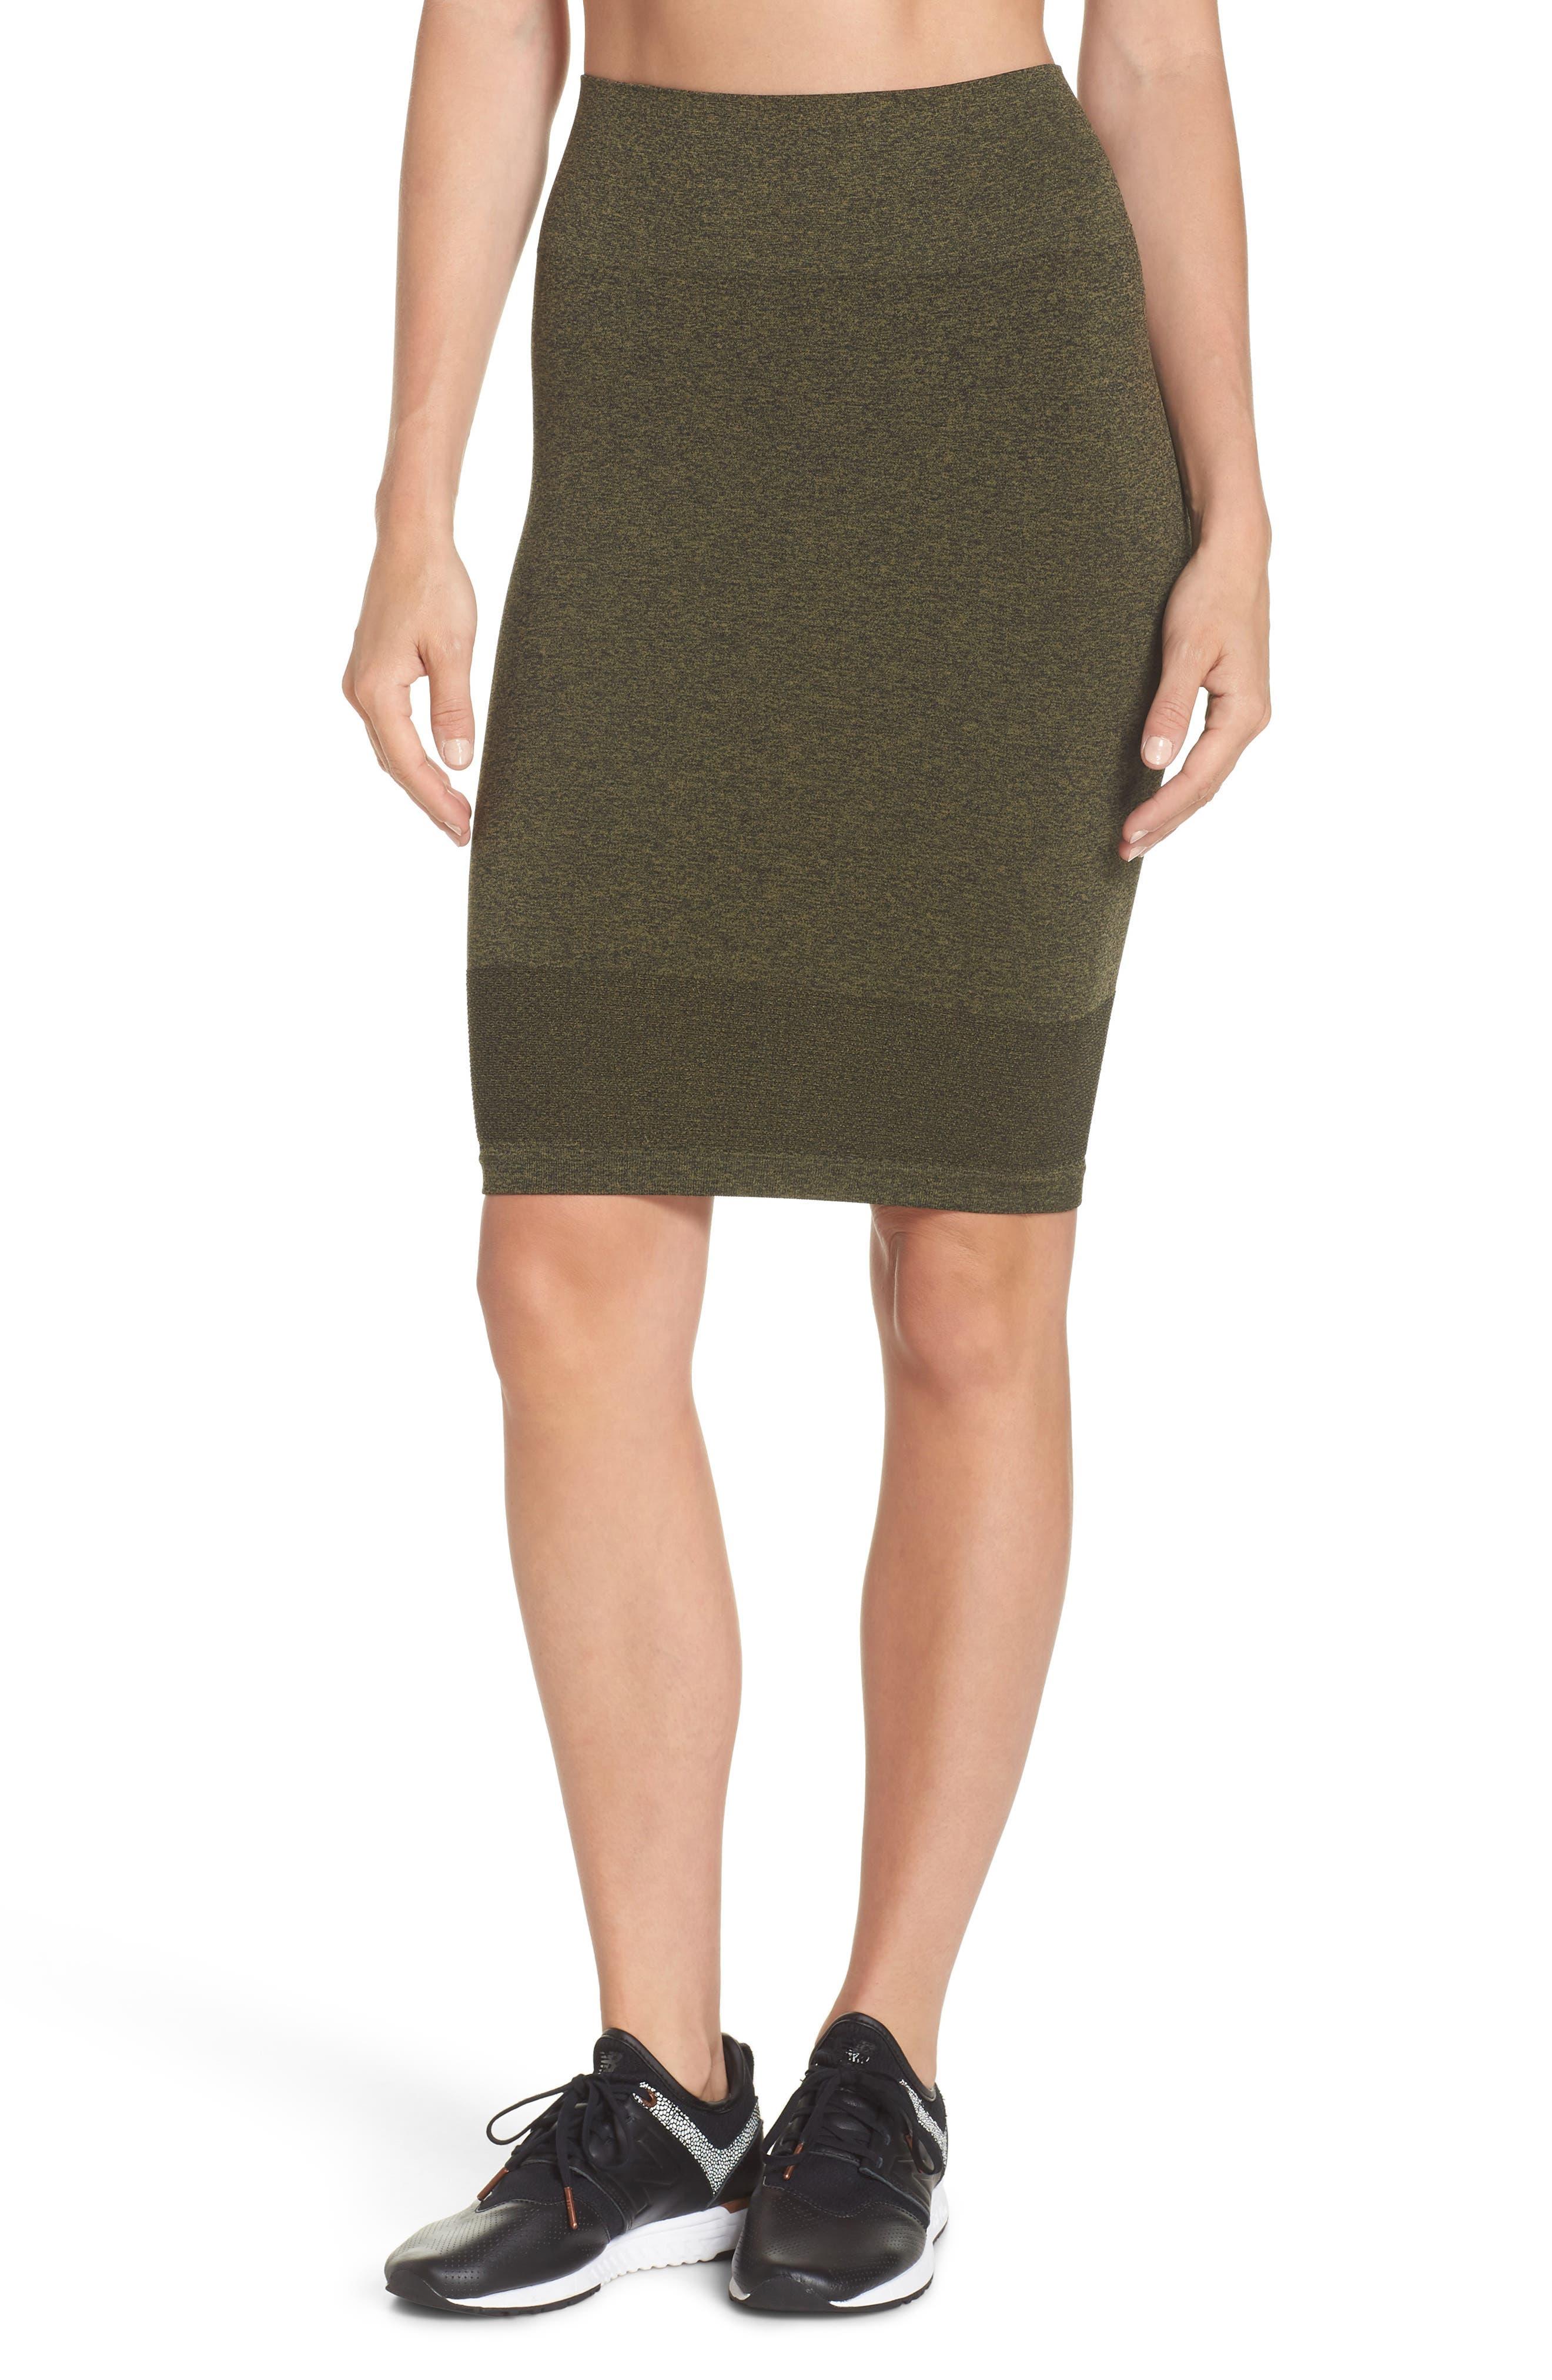 Aura Seamless Skirt,                             Main thumbnail 1, color,                             Deep Lichen Green/ Black